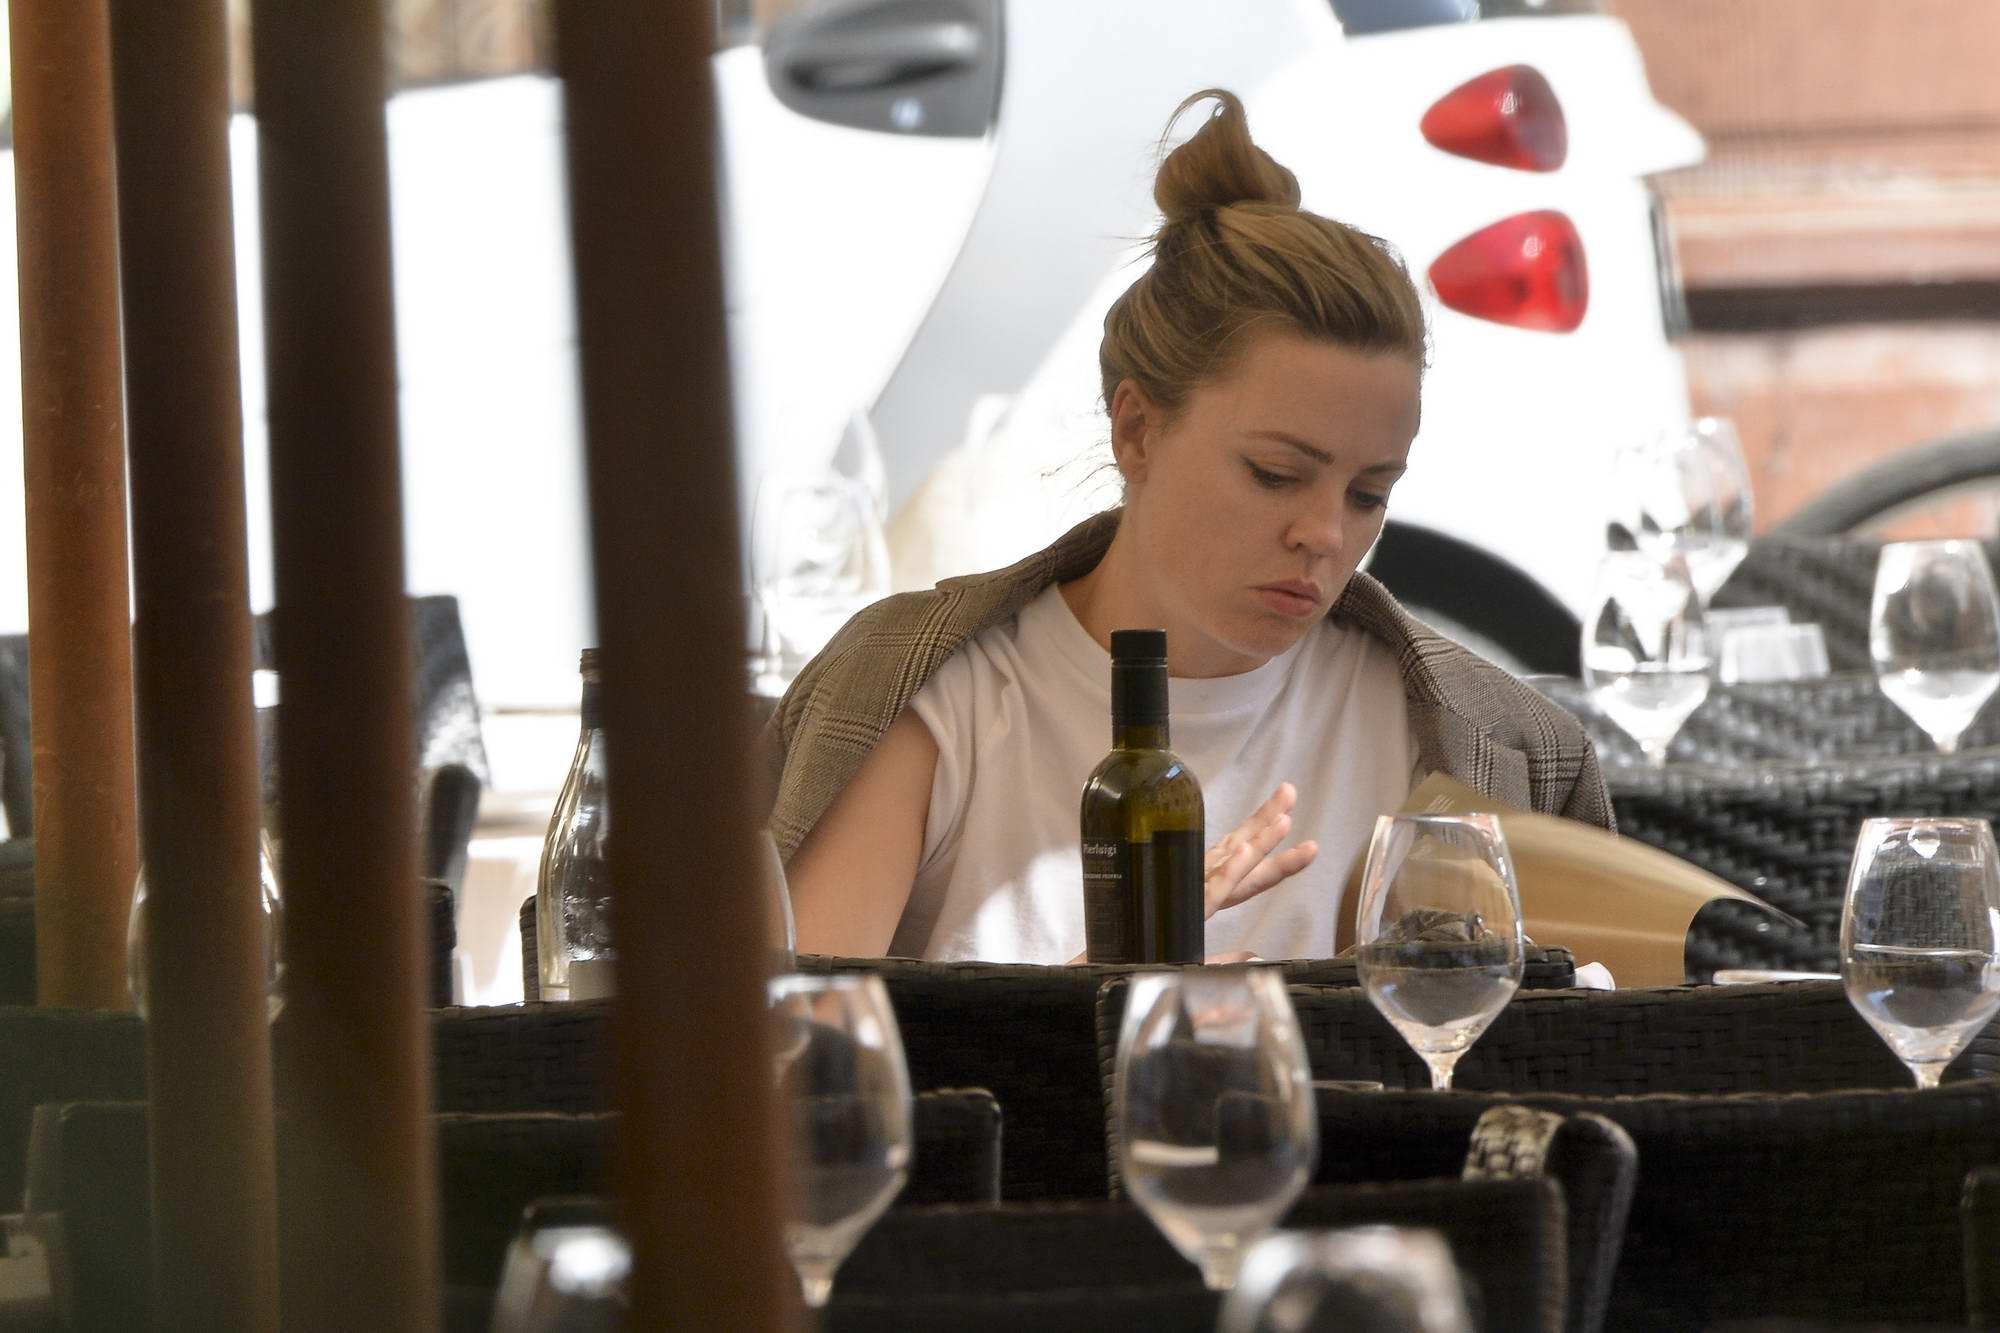 Melissa George is seen having lunch alone in Pierluigi's Restaurant in Rome, Italy